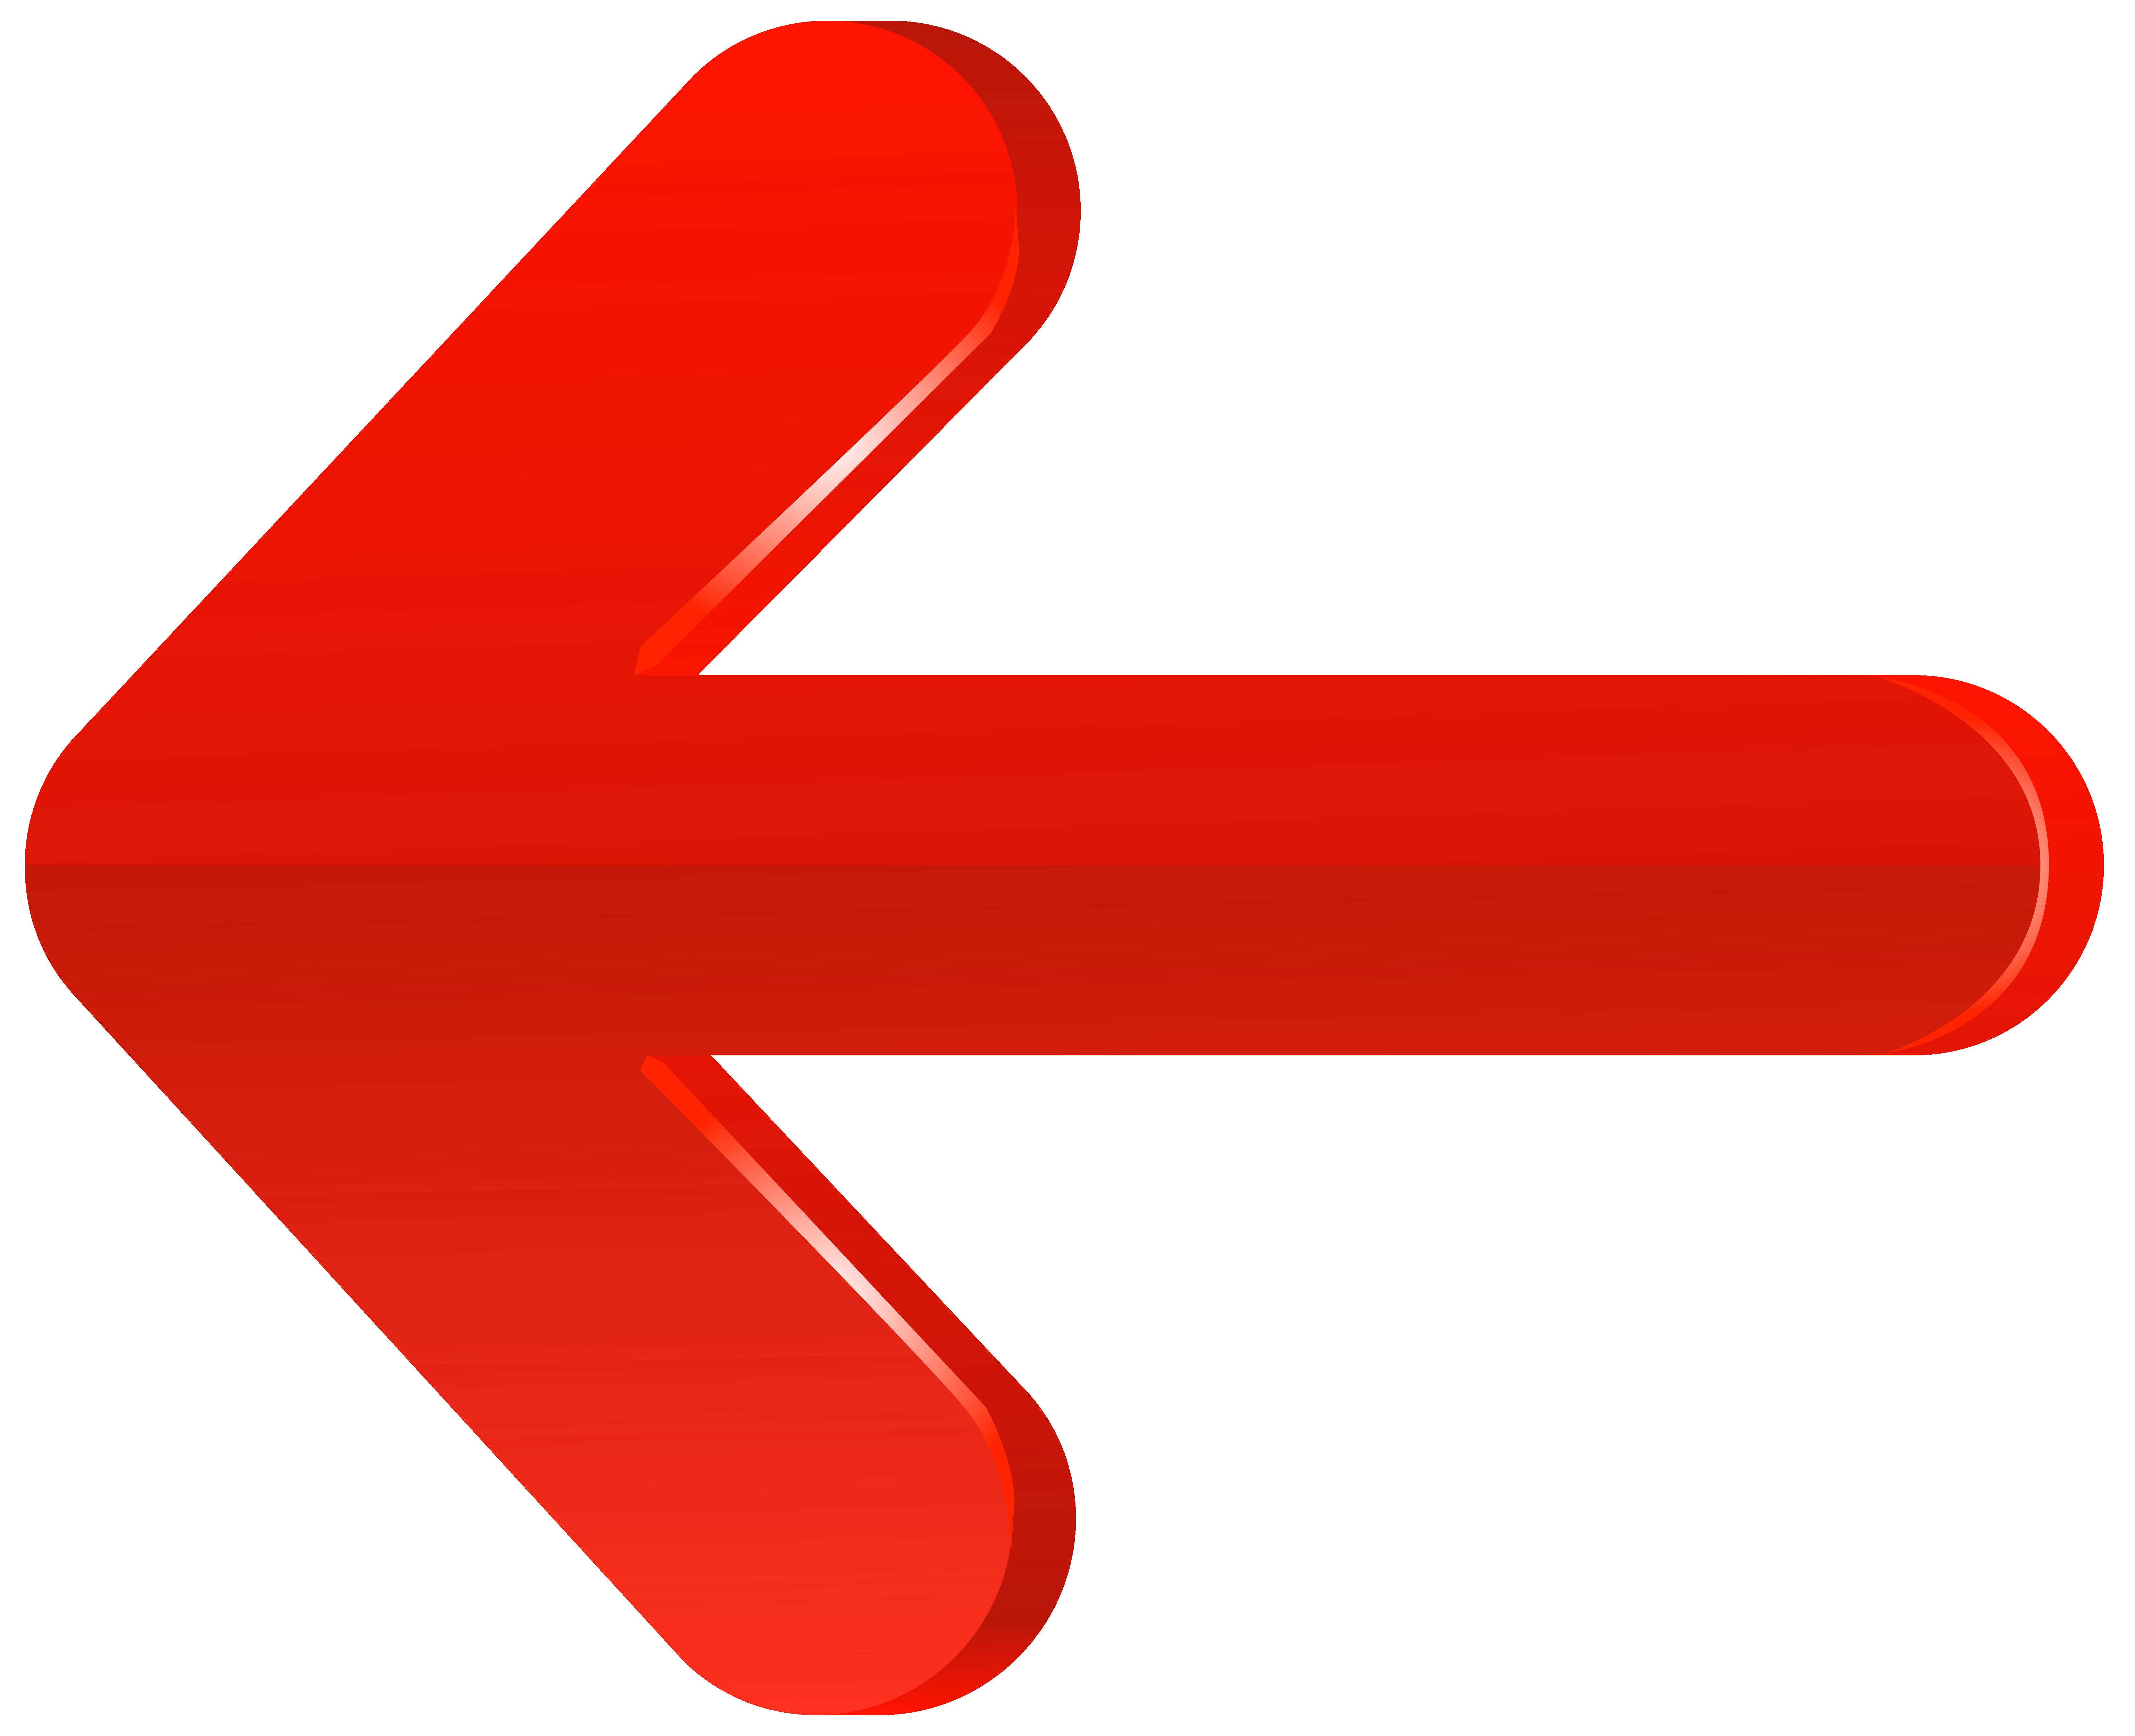 Left red png transparent. Finger clipart arrow